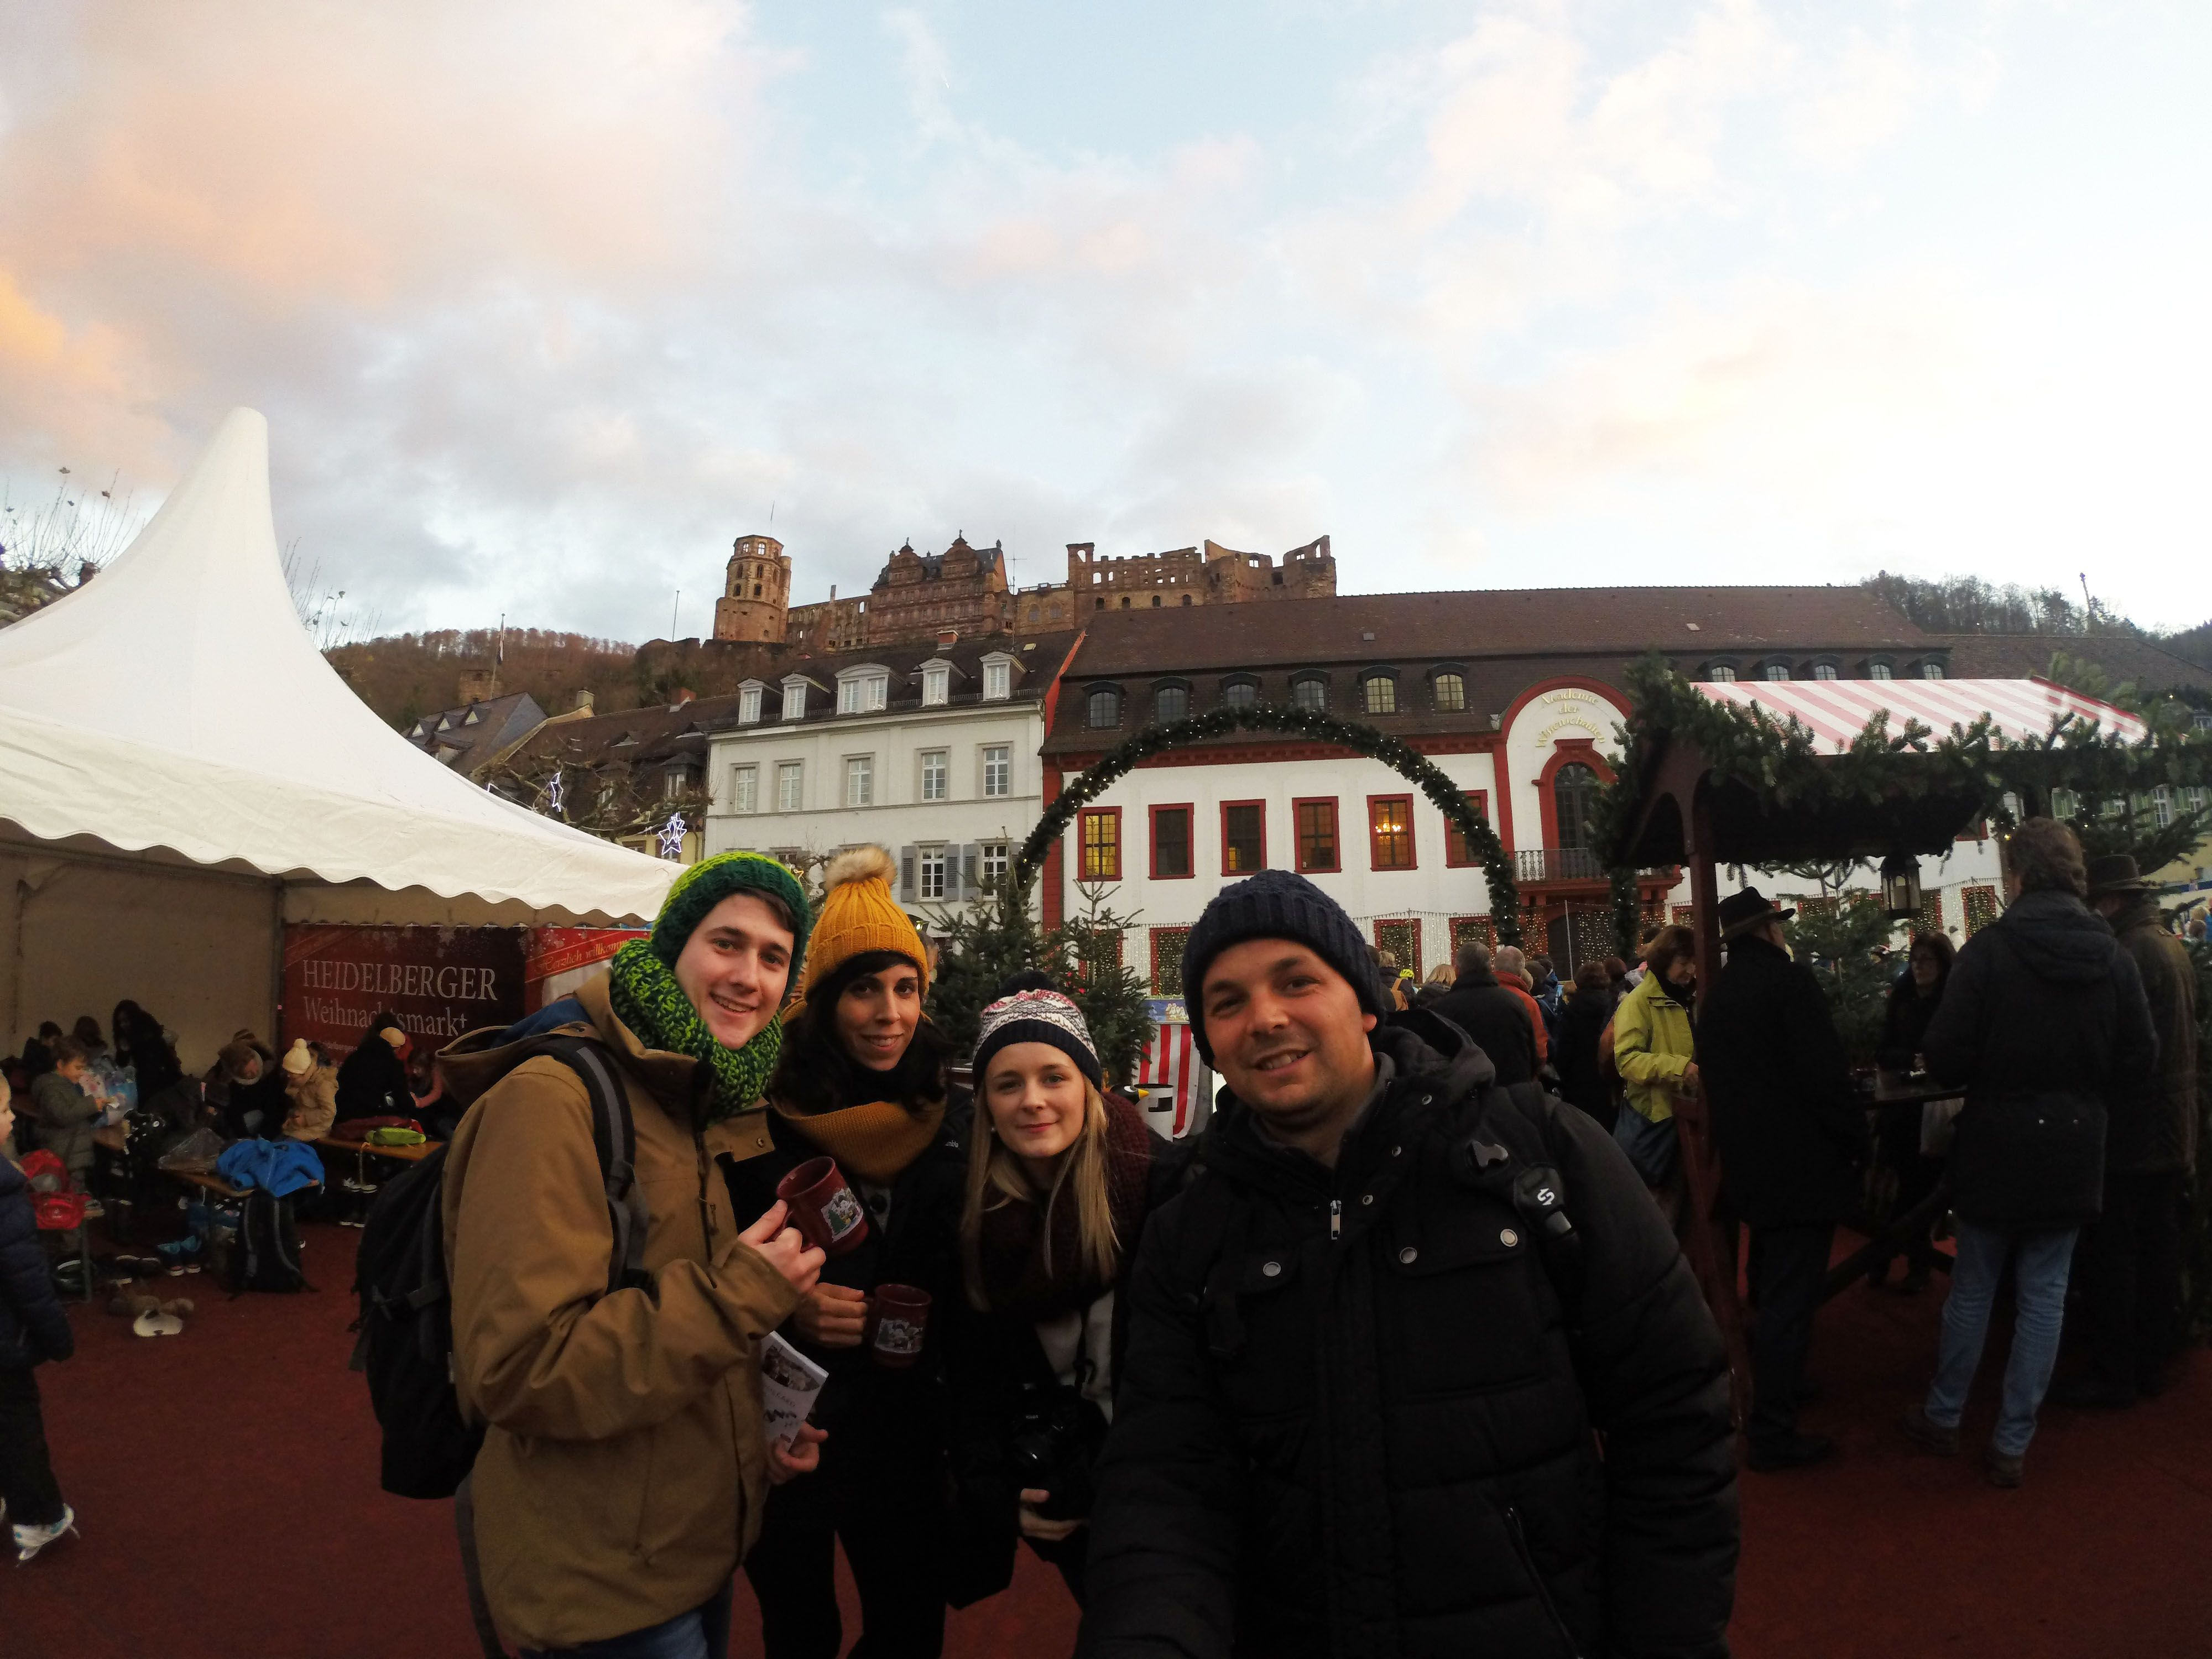 Mercado navideño Heidelberg